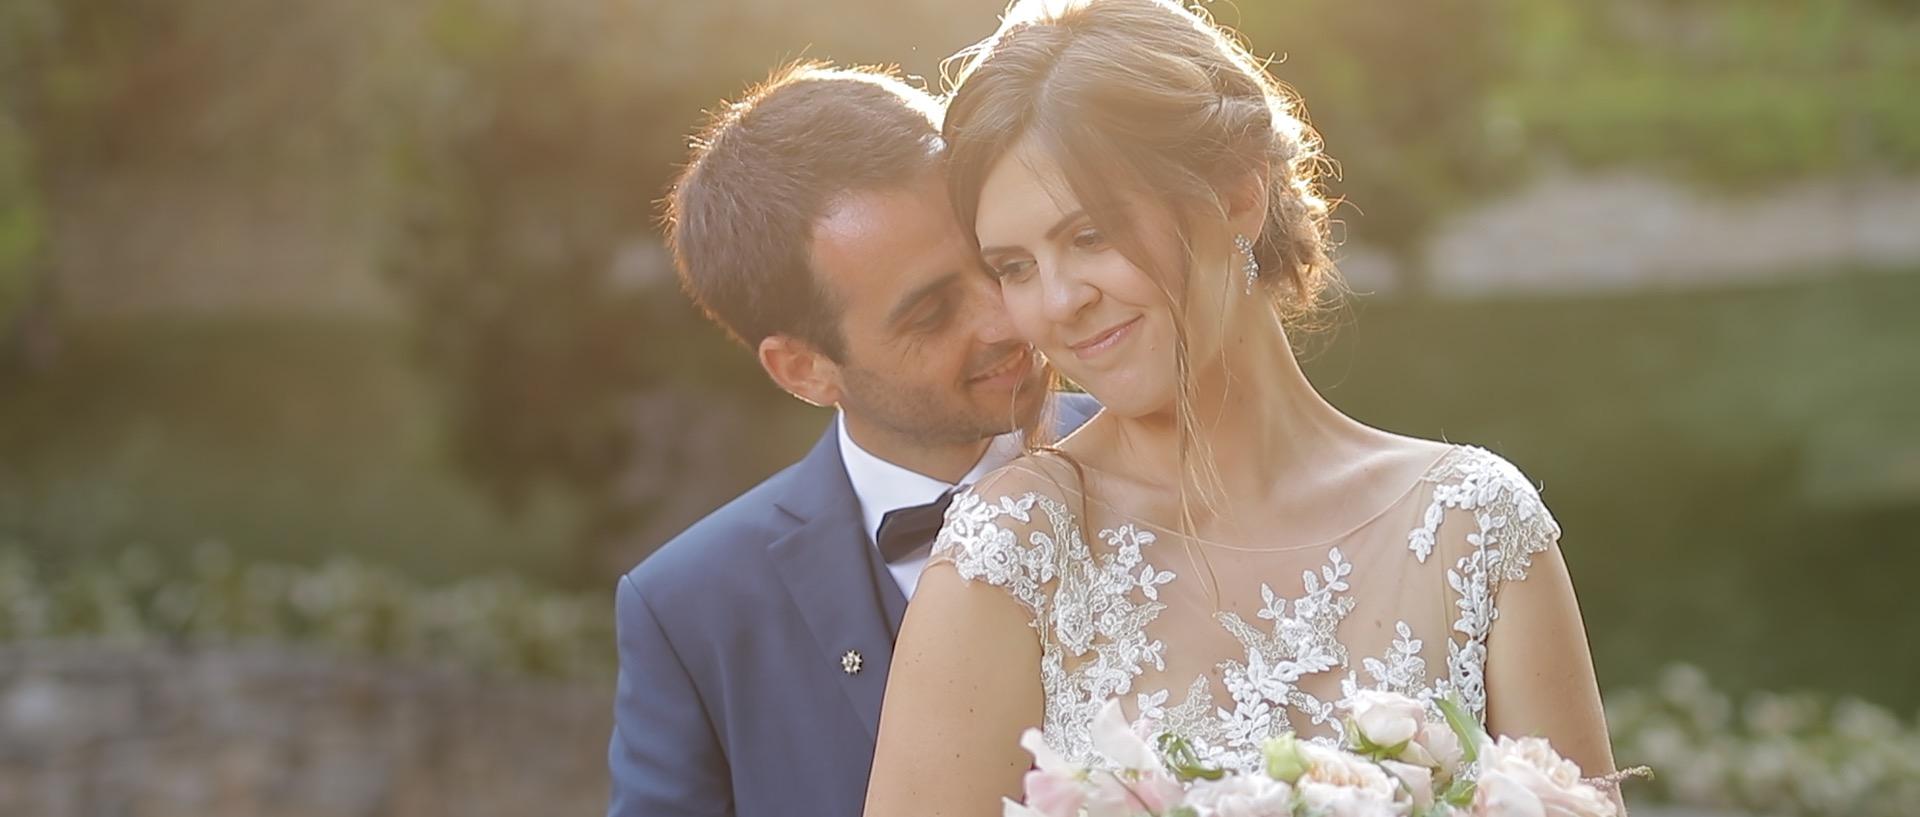 cannes wedding videographer